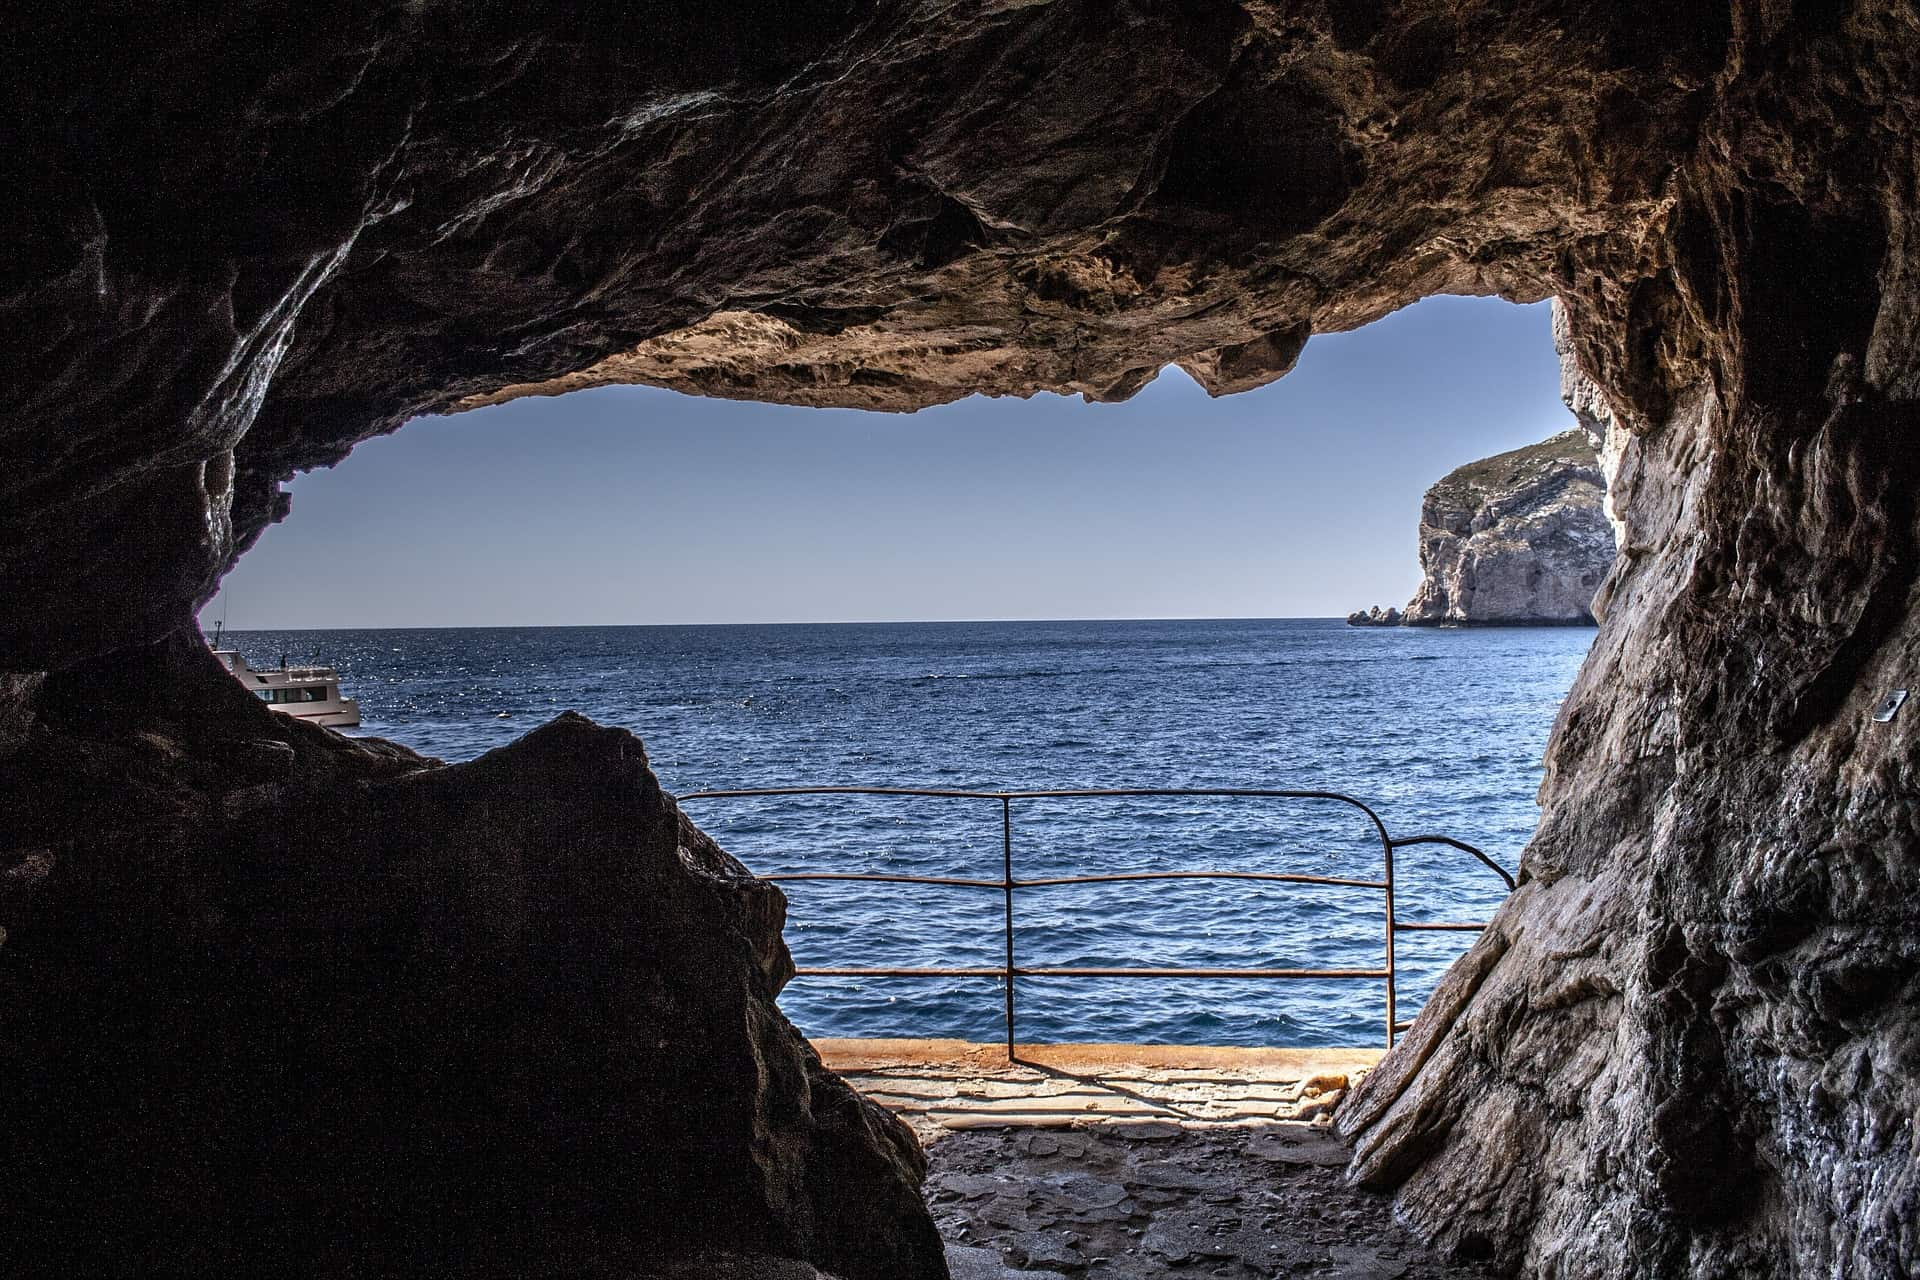 Sardegna segreta: 5 posti insoliti e misteriosi da visitare